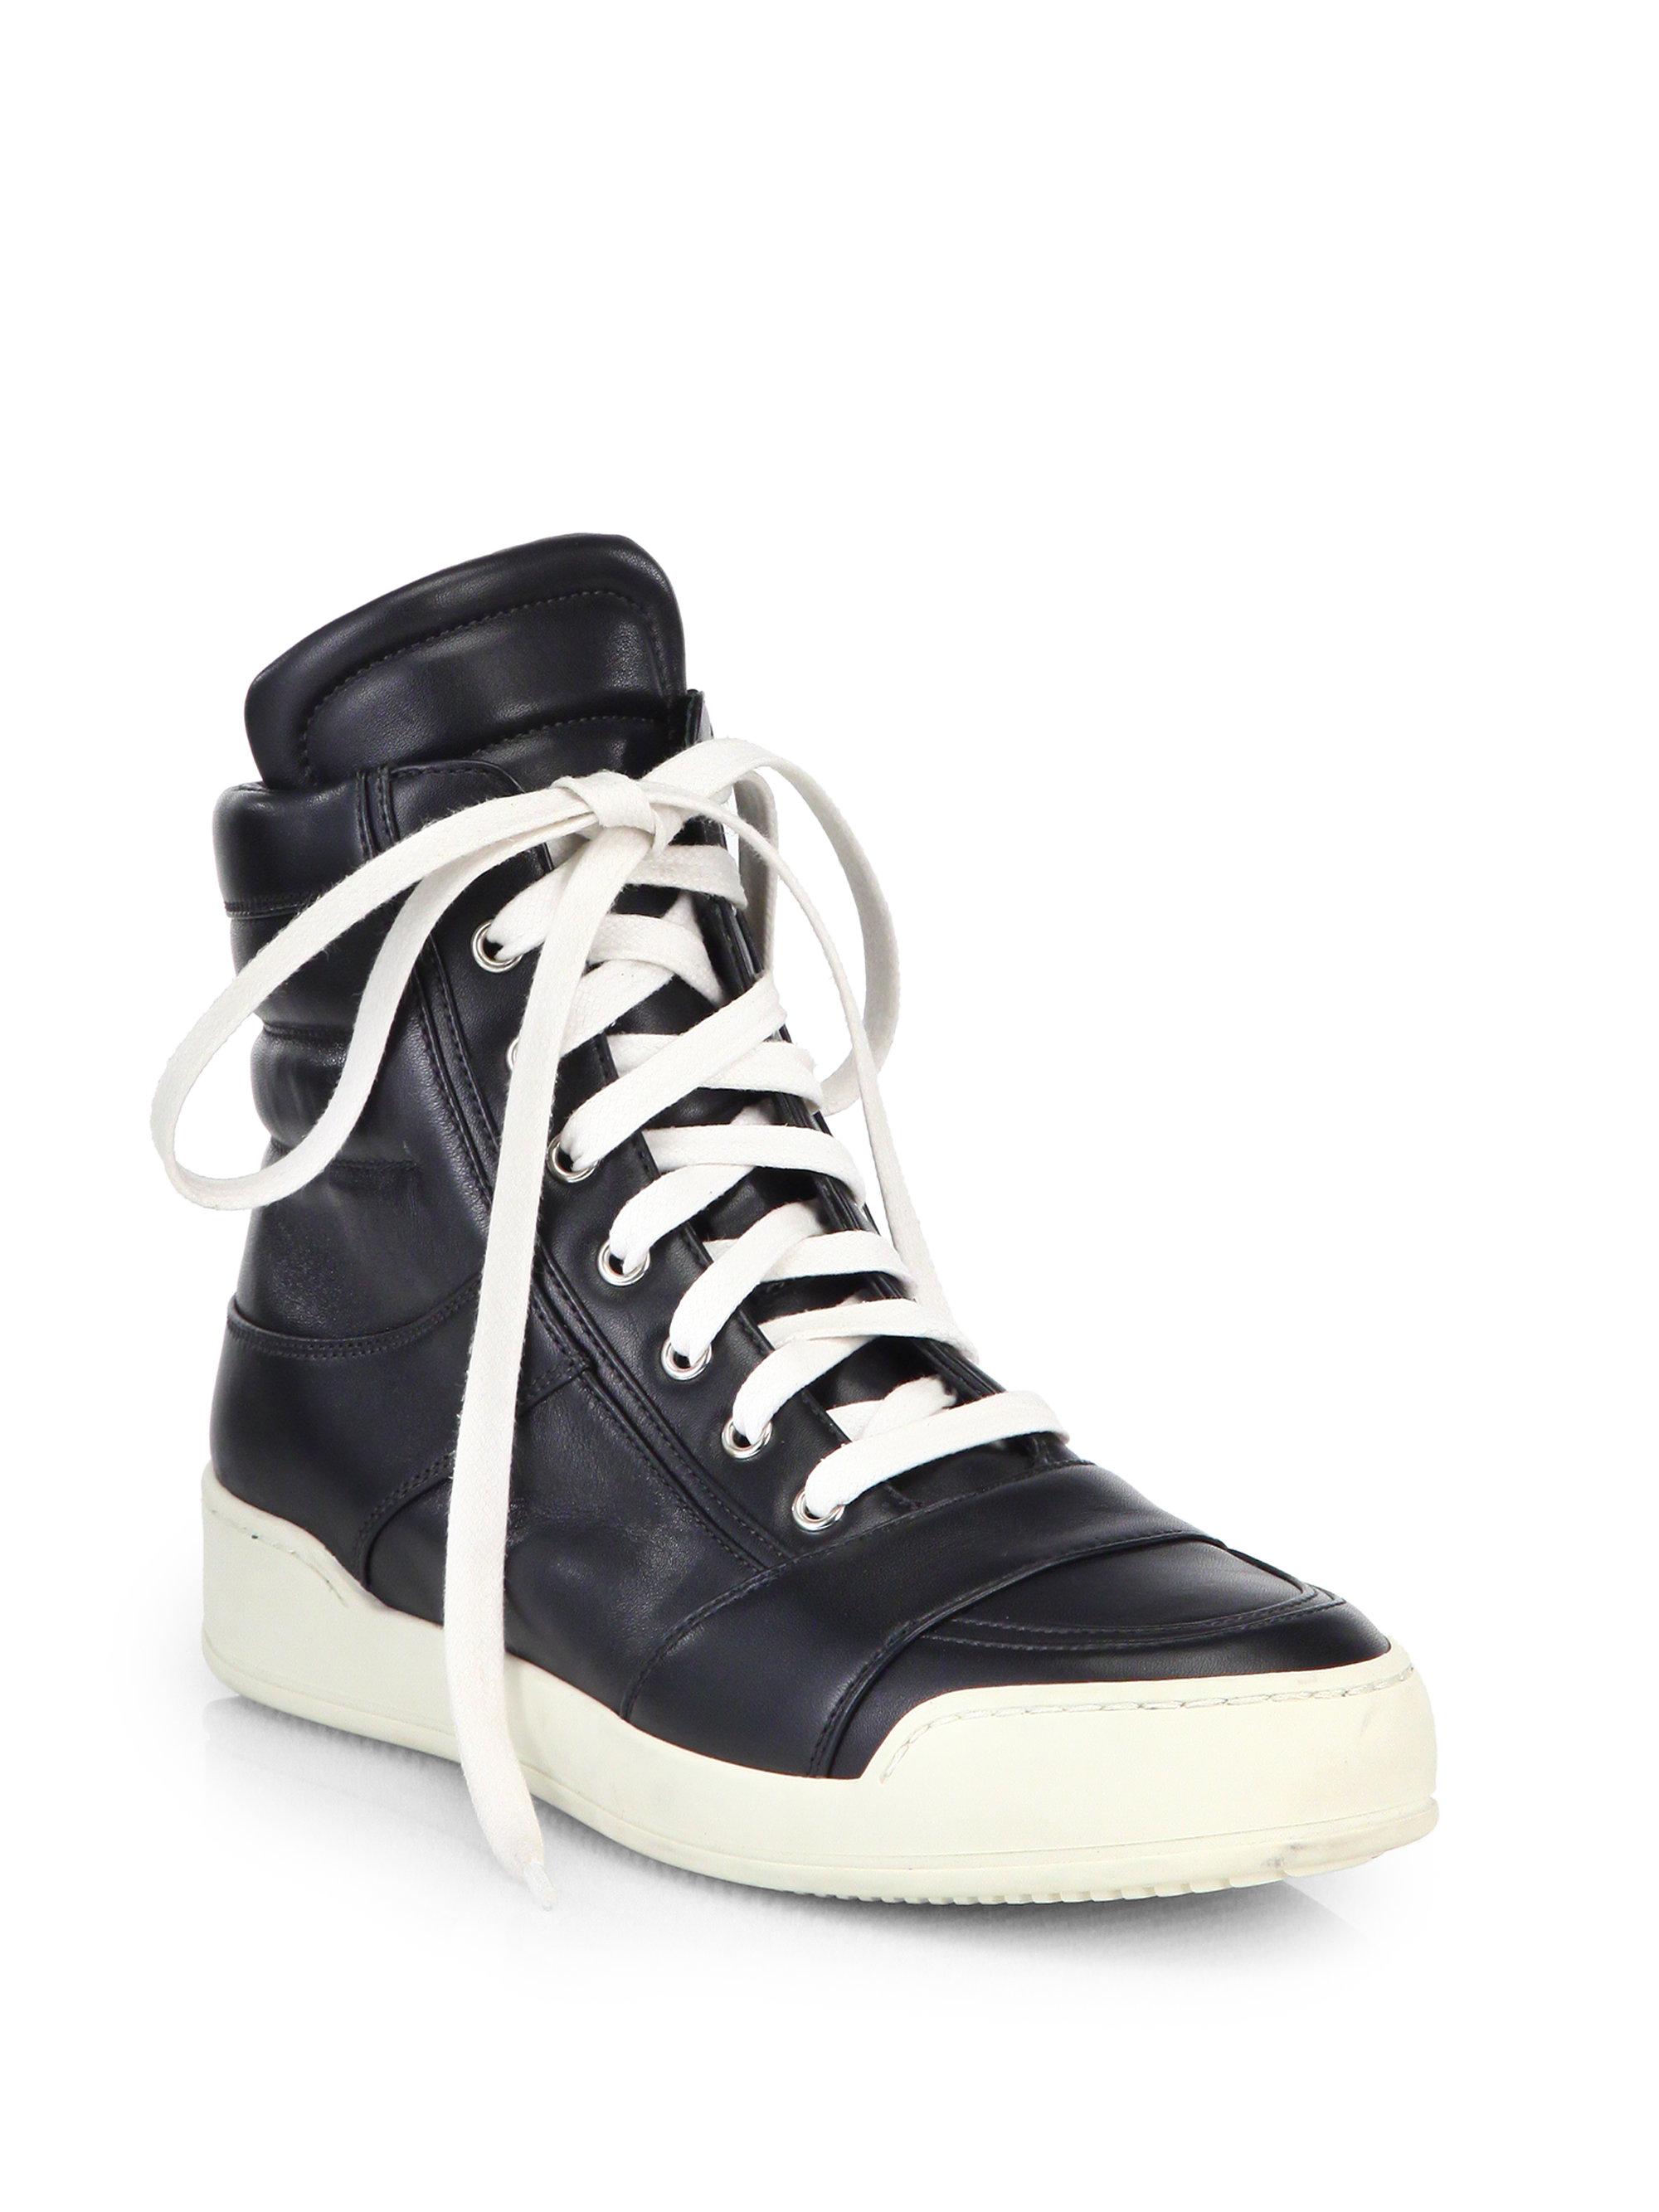 Balmain Black Leather High-Top Sneakers VZpkjssb21